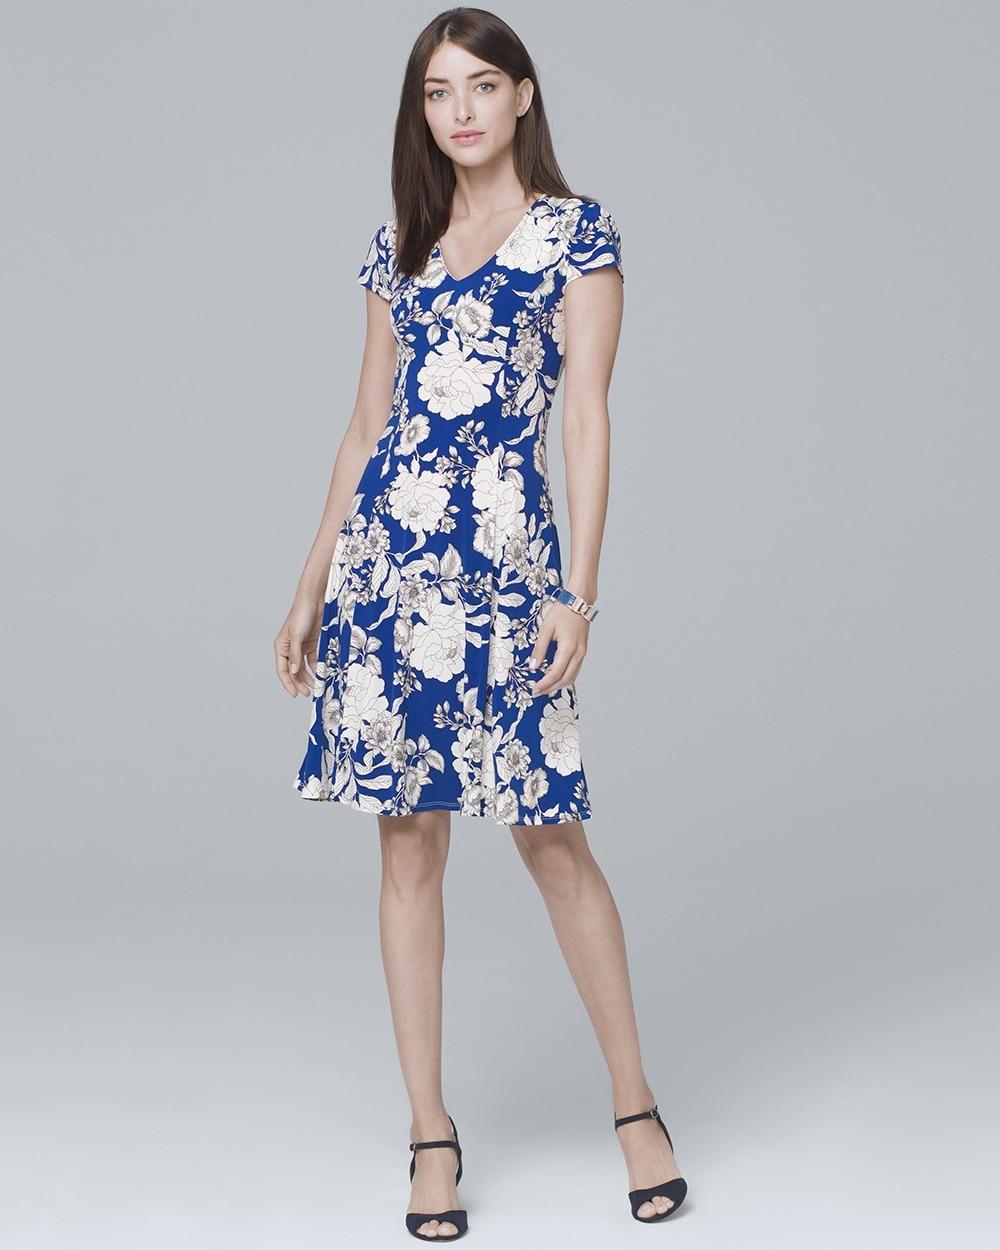 bec0de3f65b Floral-Print Knit A-Line Dress